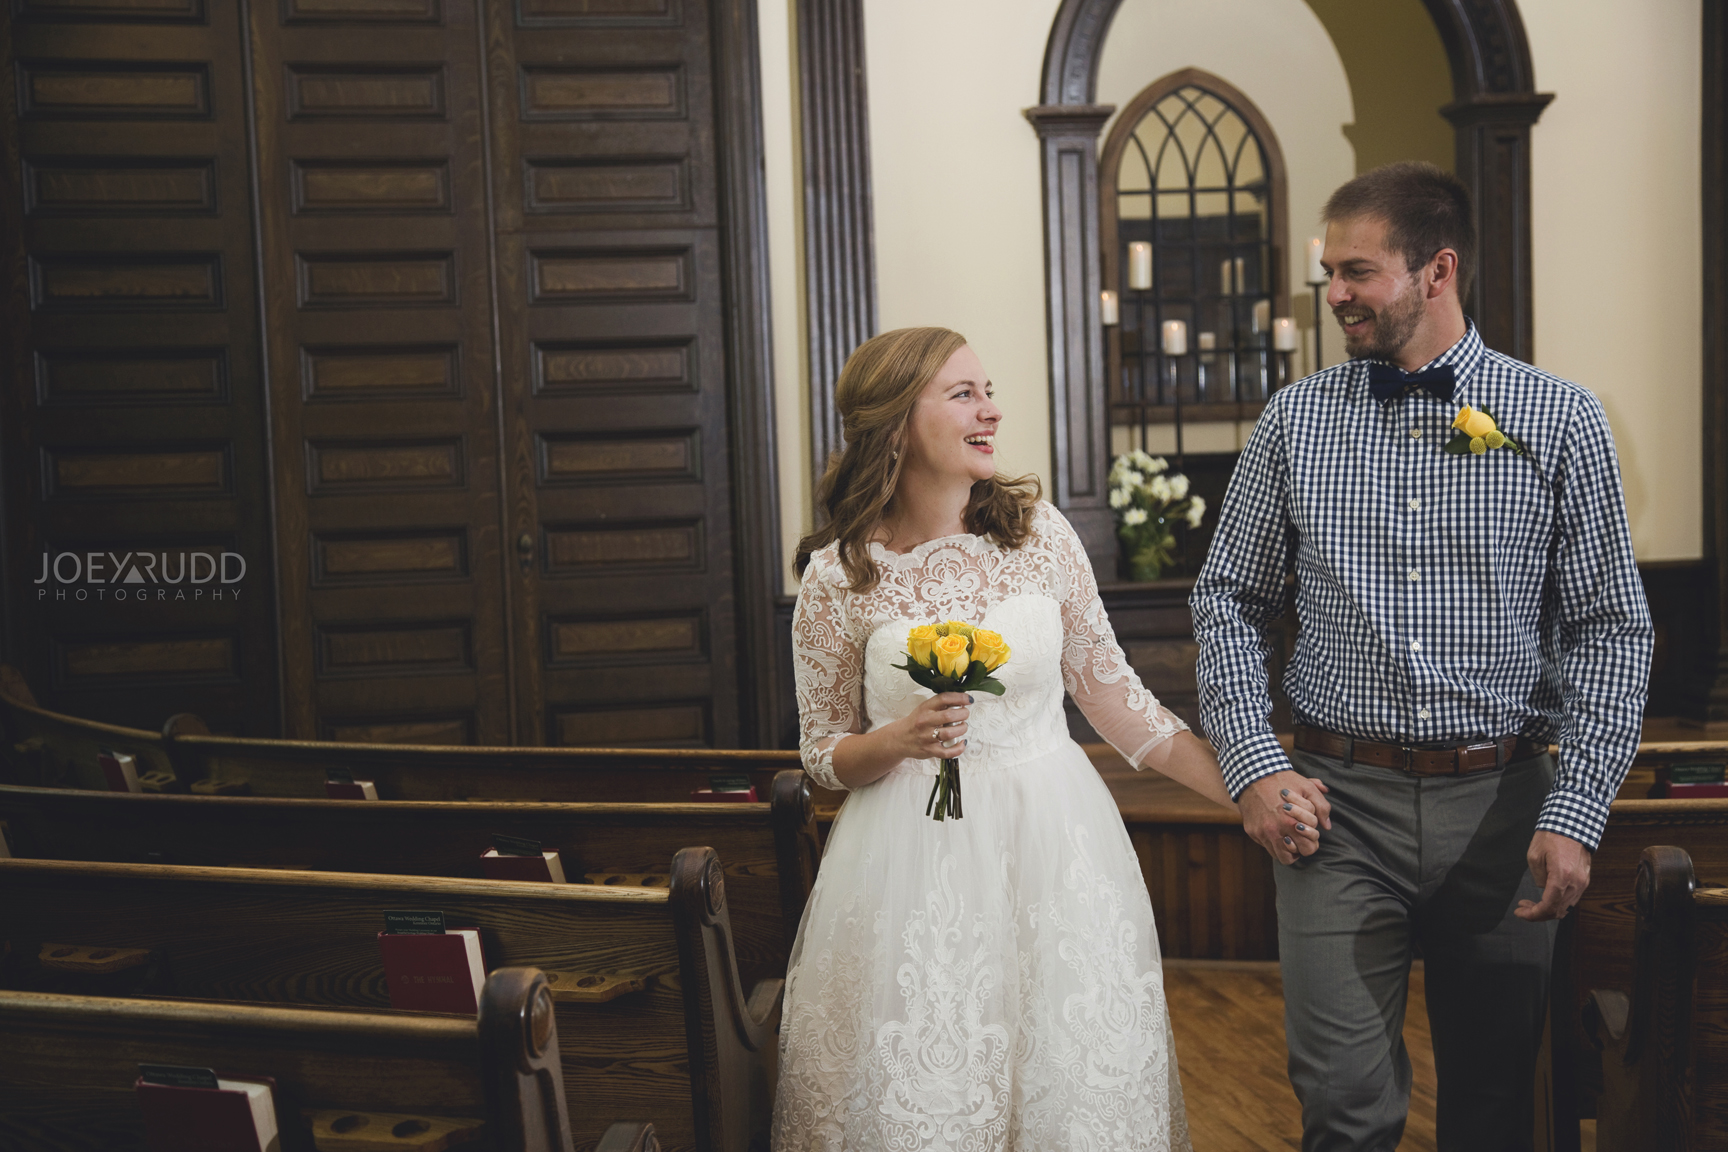 Ottawa Elopement by Joey Rudd Photography Ottawa Wedding Photographer Mer Bleue Ottawa Wedding Chapel Recessional